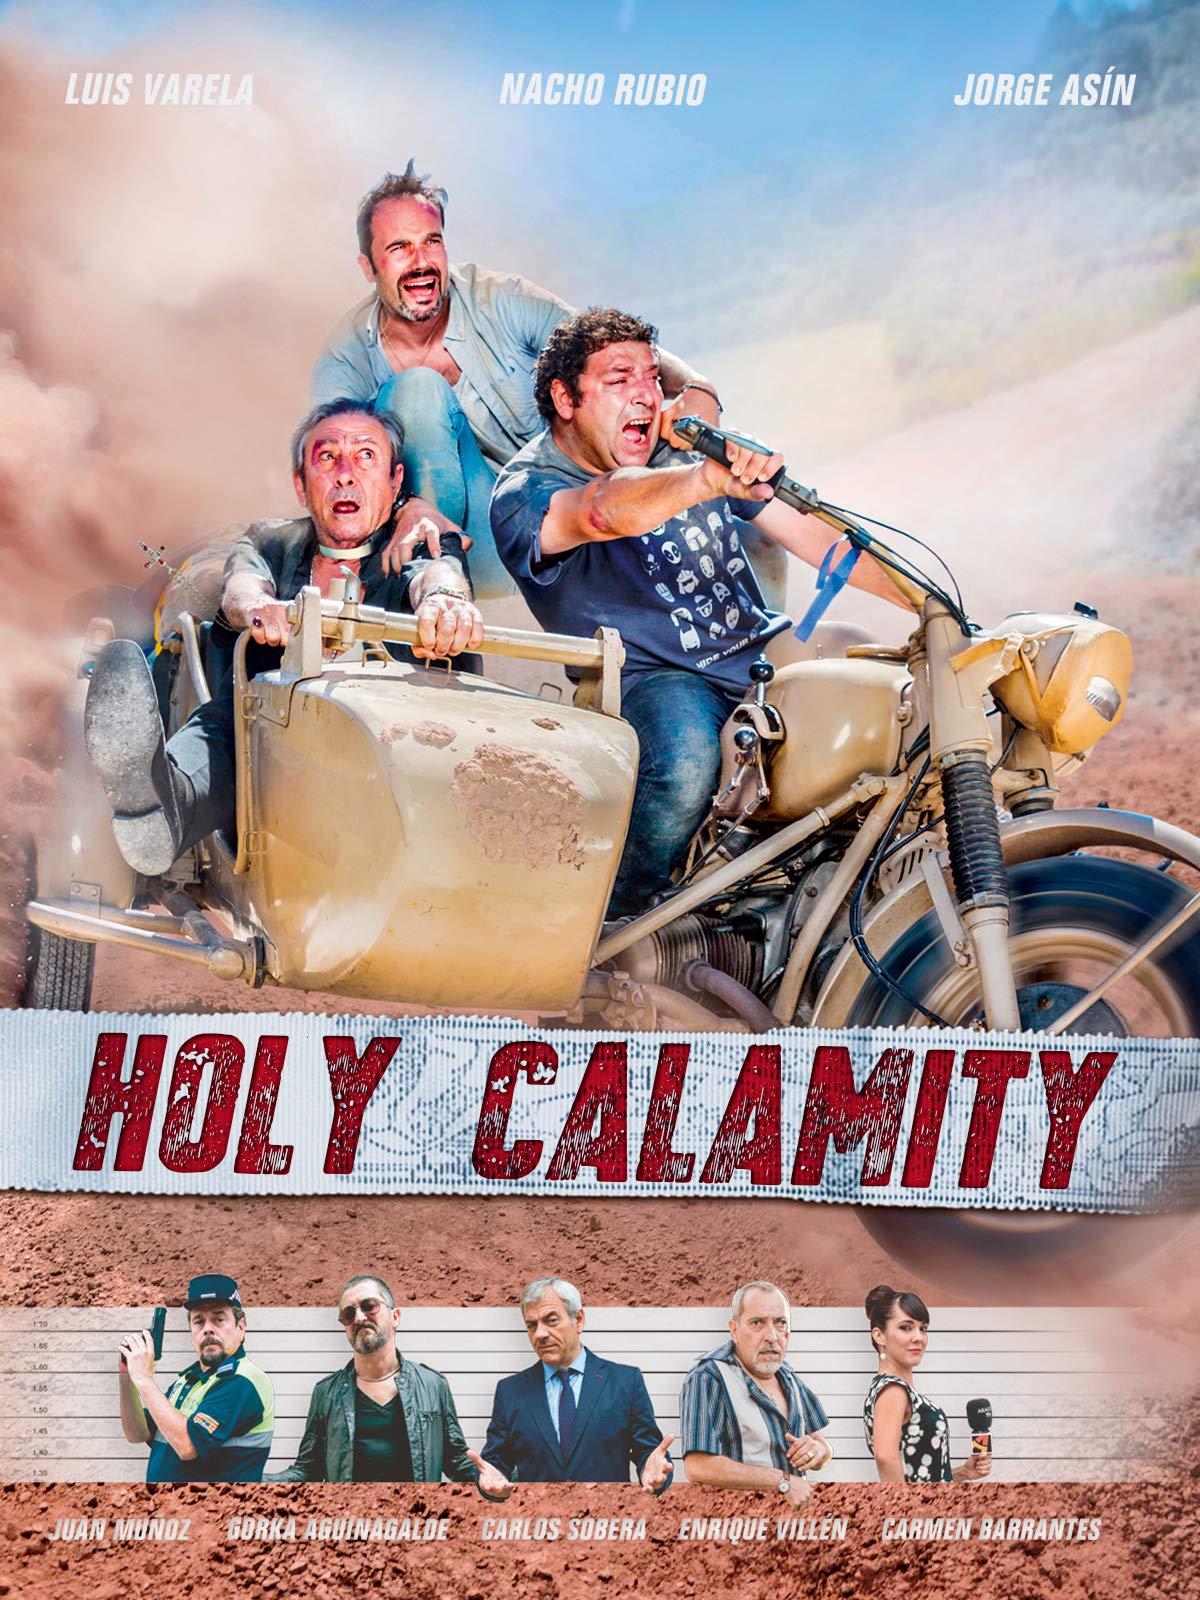 Holy calamity